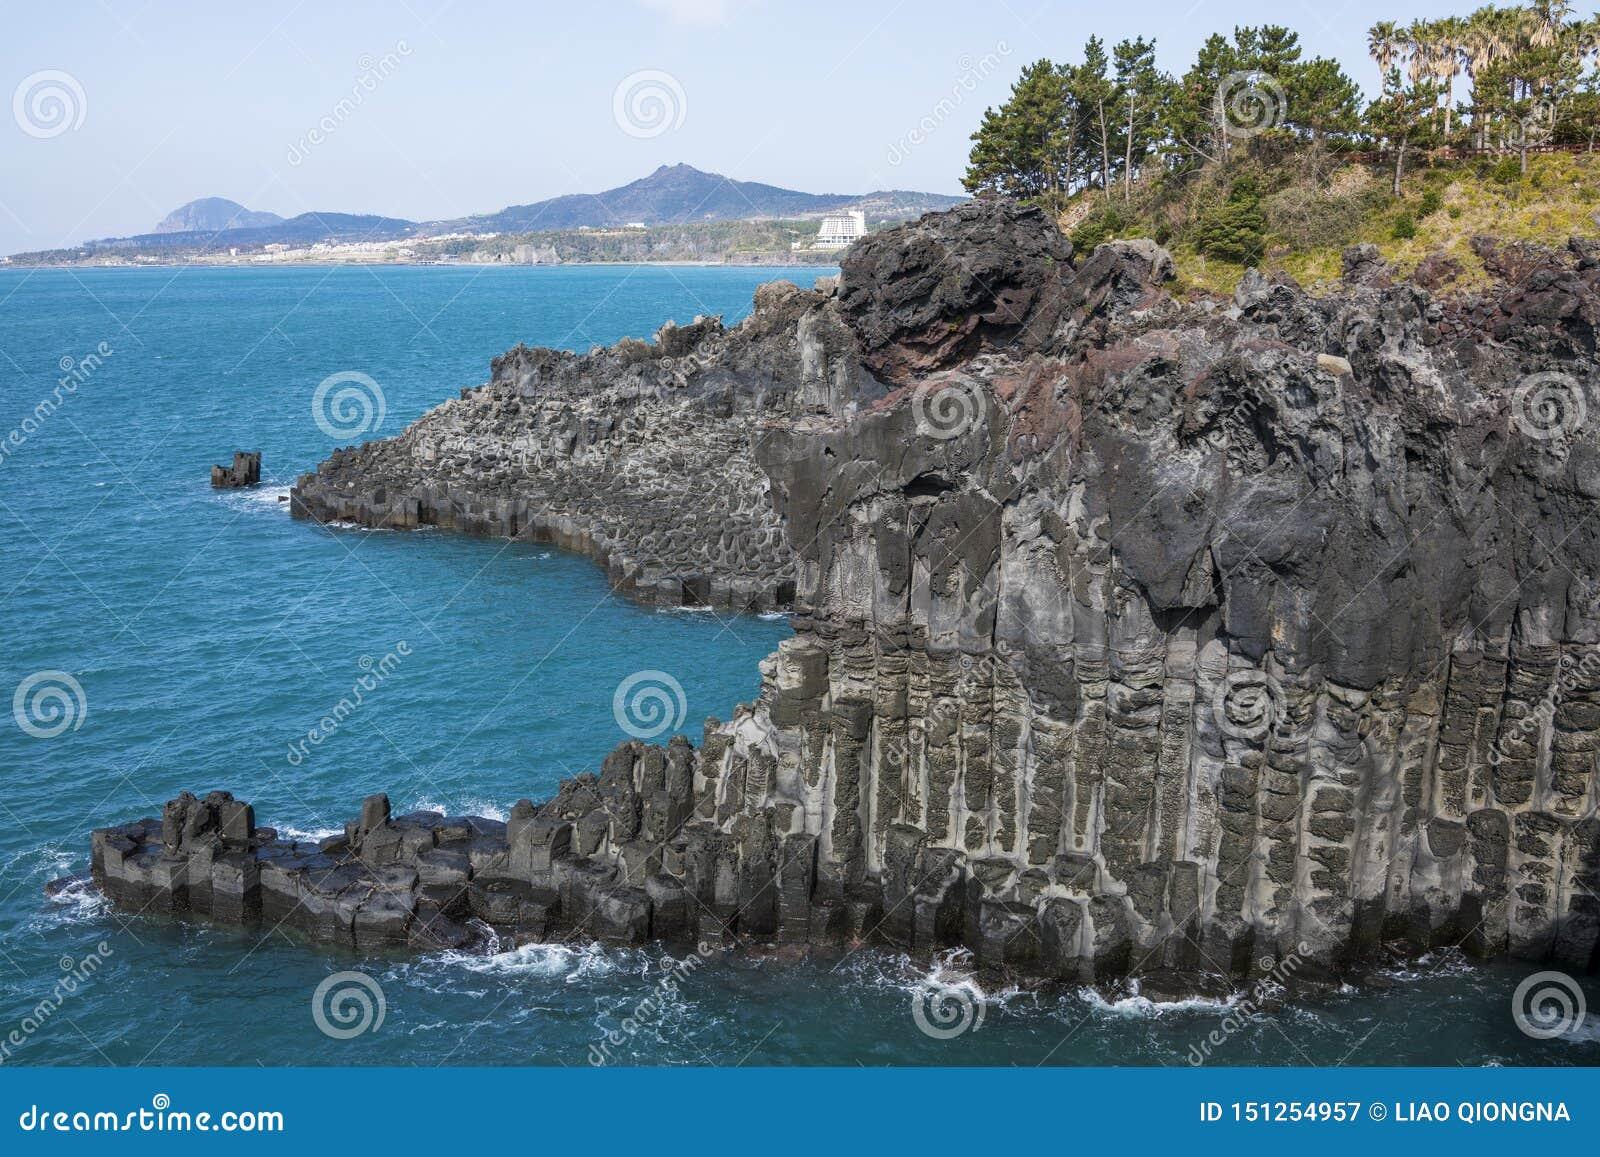 Jusangjeollidae的看法 Jusangjeolli是石柱子被堆沿海并且是济州的一座选定的文化纪念碑